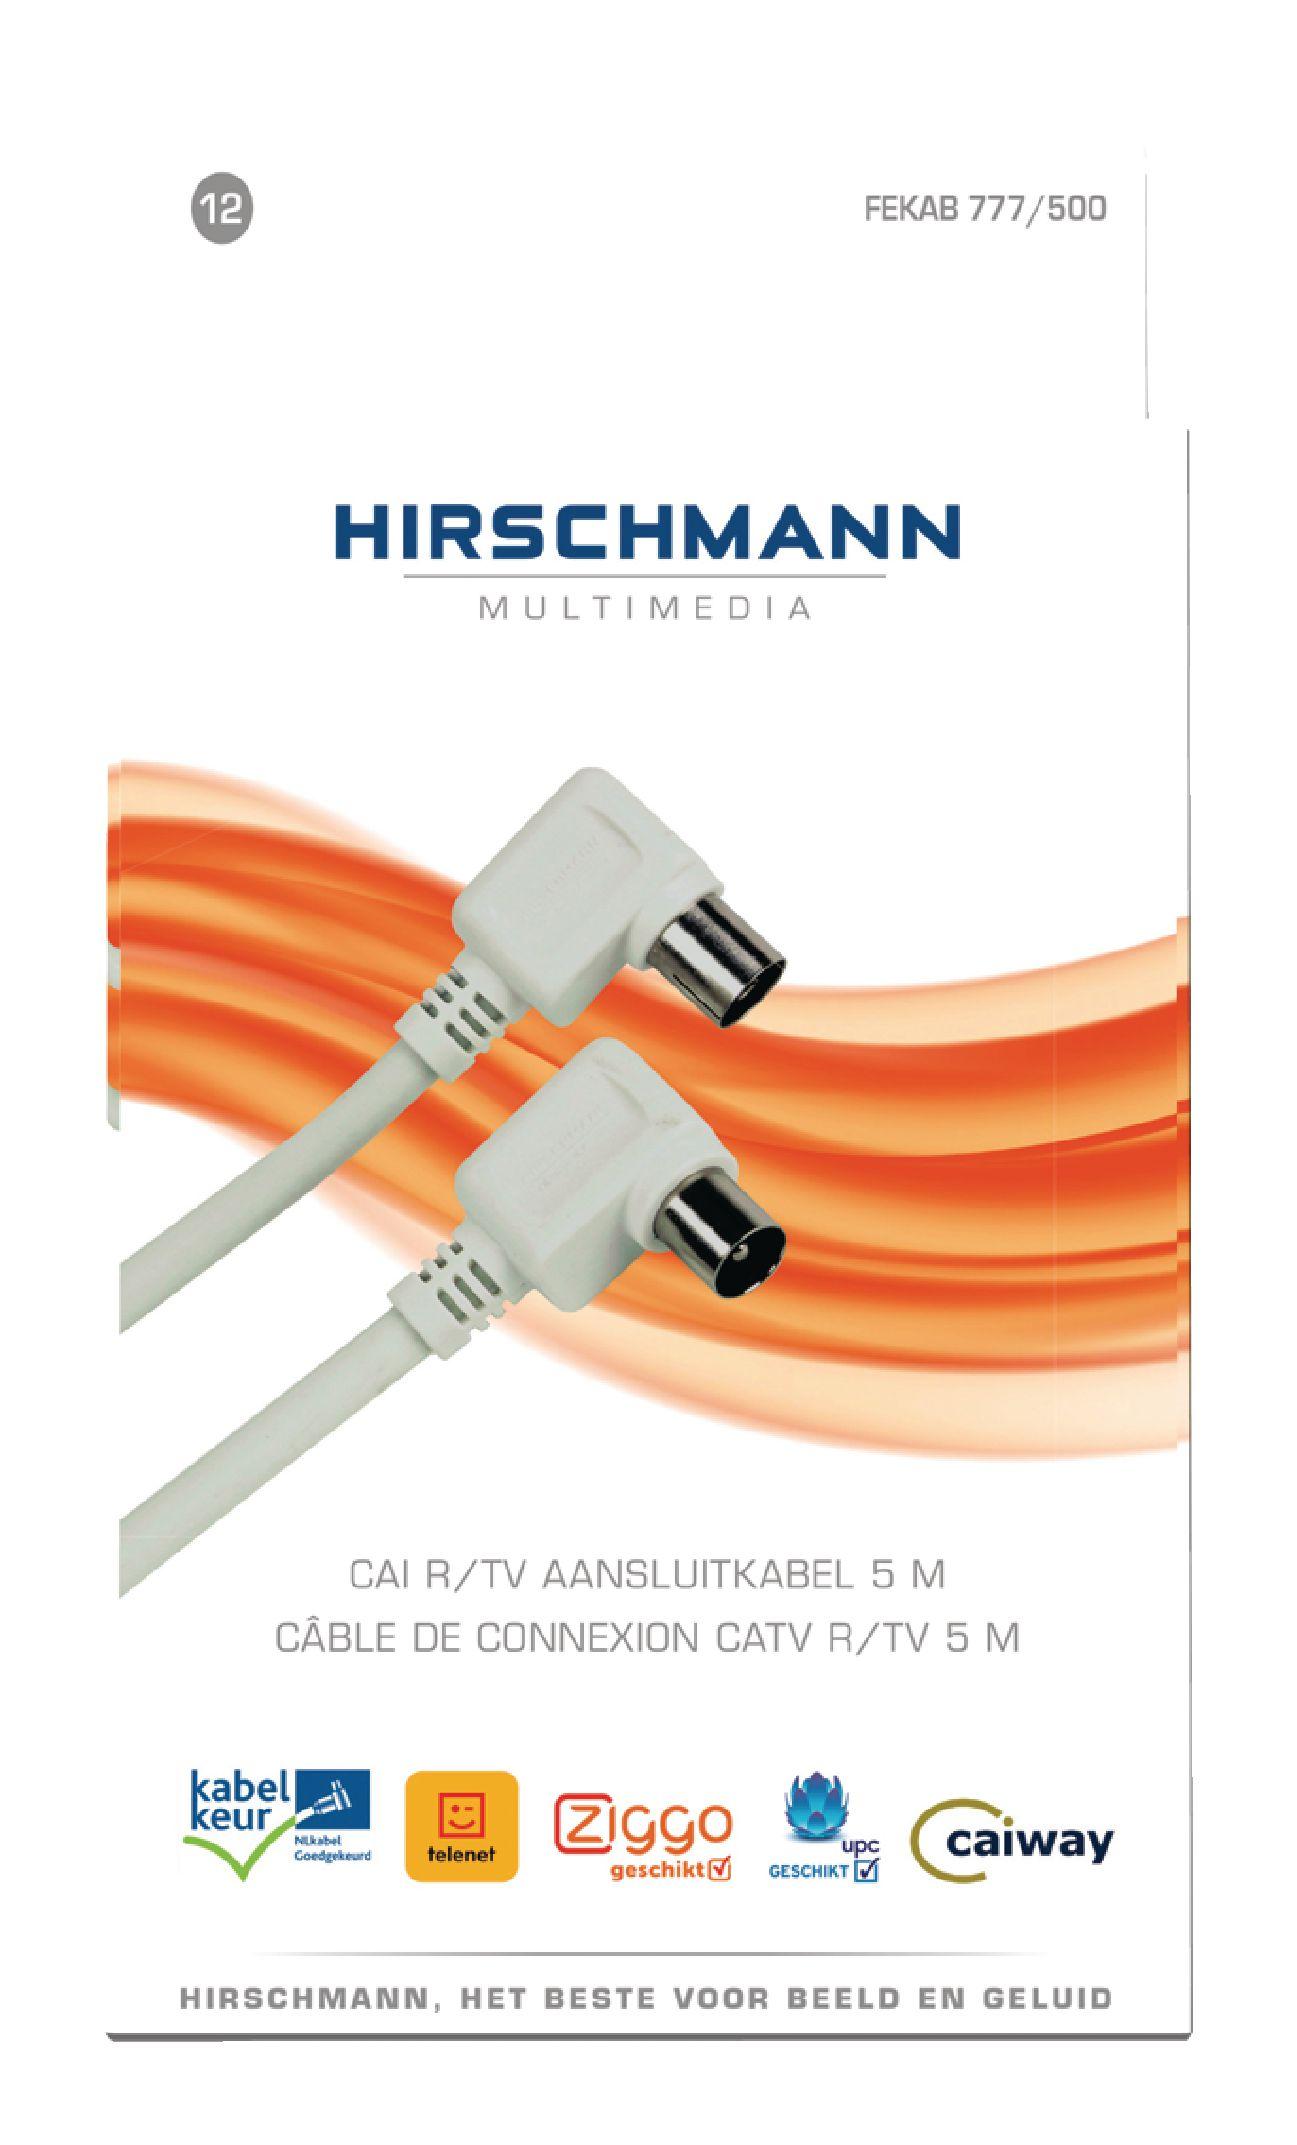 rh fkb777 5 0 hirschmann c ble antenne coaxial fekab coax m le iec coax femelle iec 5. Black Bedroom Furniture Sets. Home Design Ideas